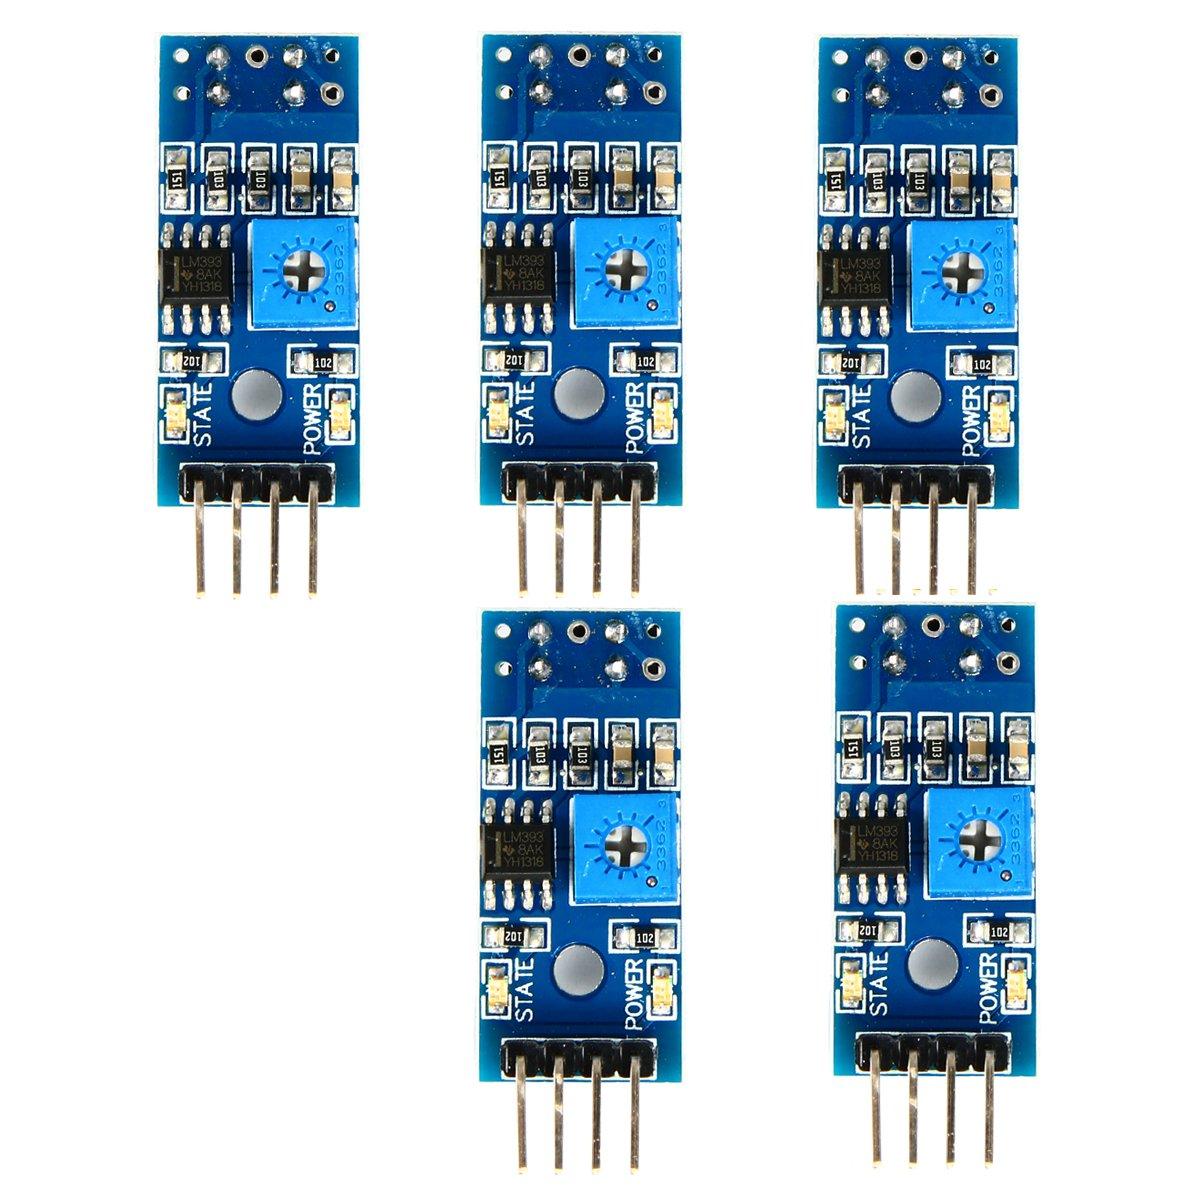 5 TCRT5000 IR Barrier Track Sensor Infrared Reflective Photoelectric ...